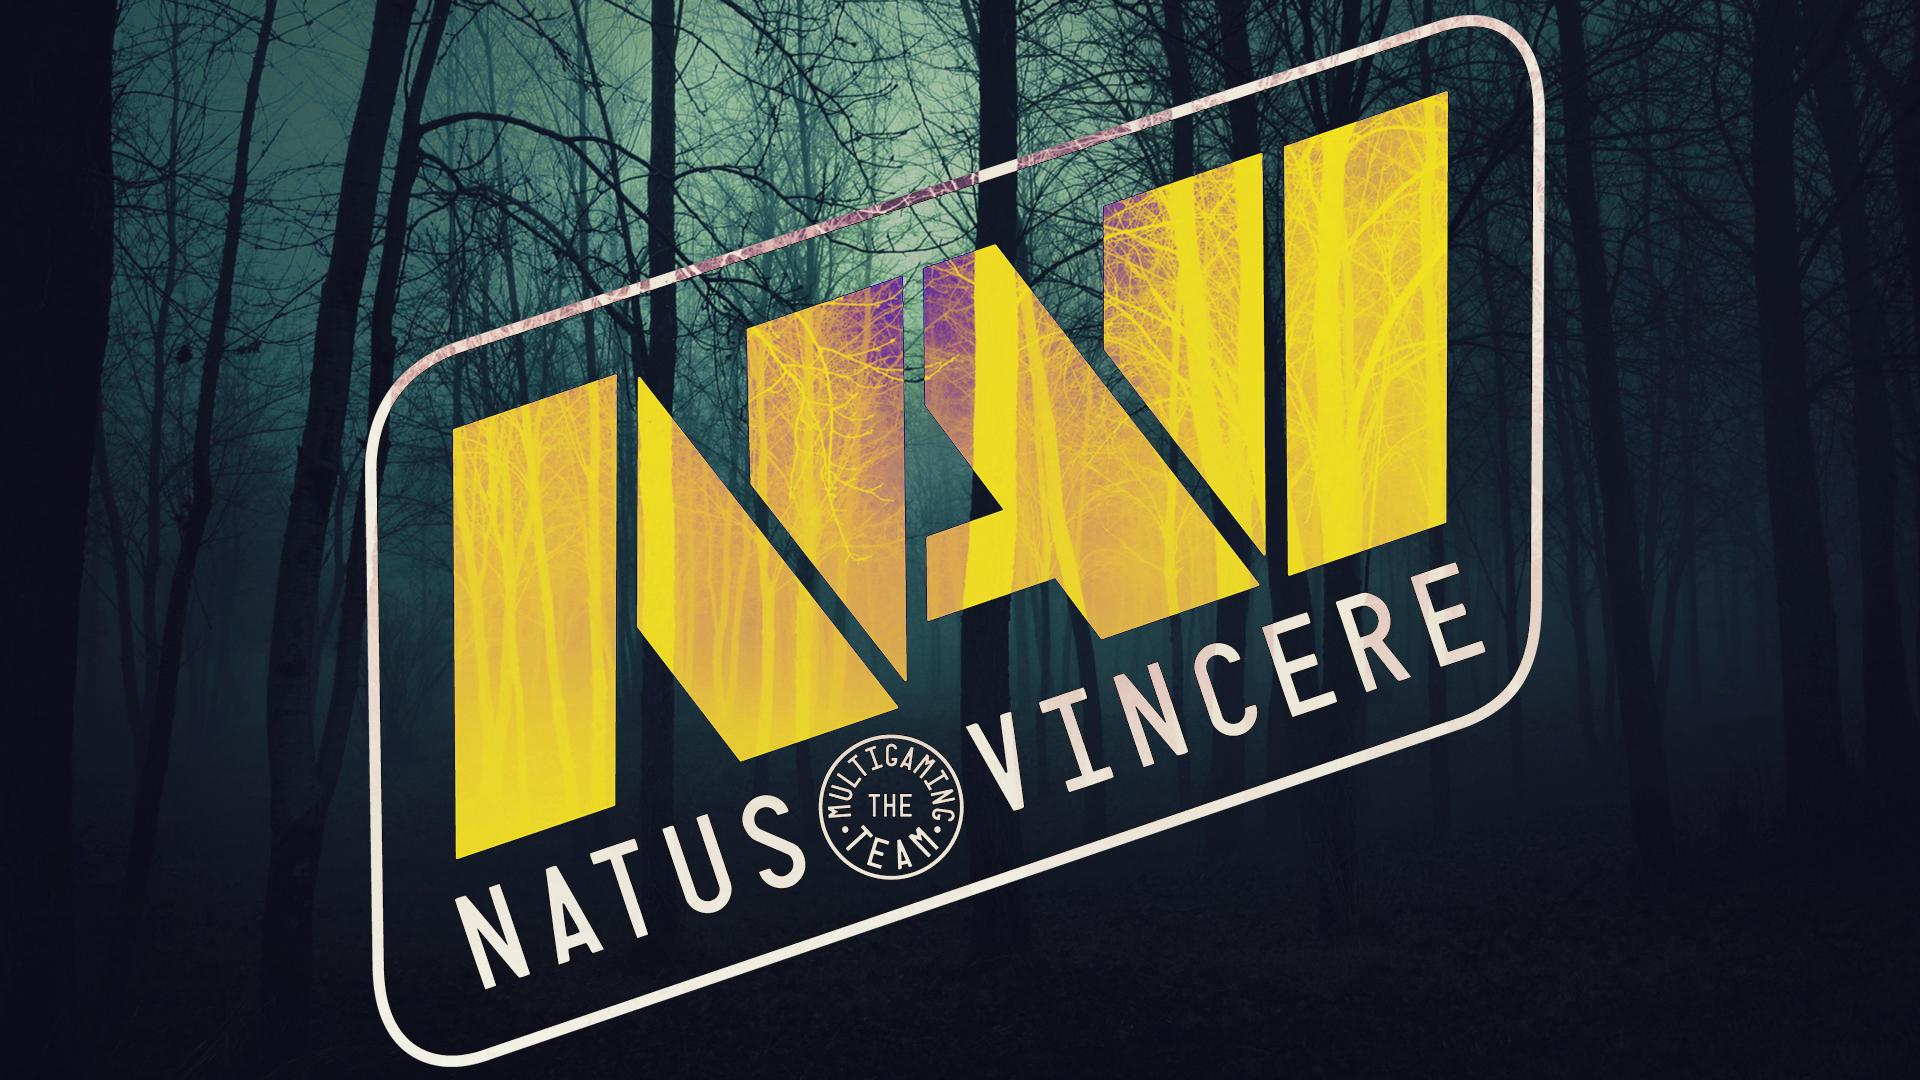 NaVi Forest